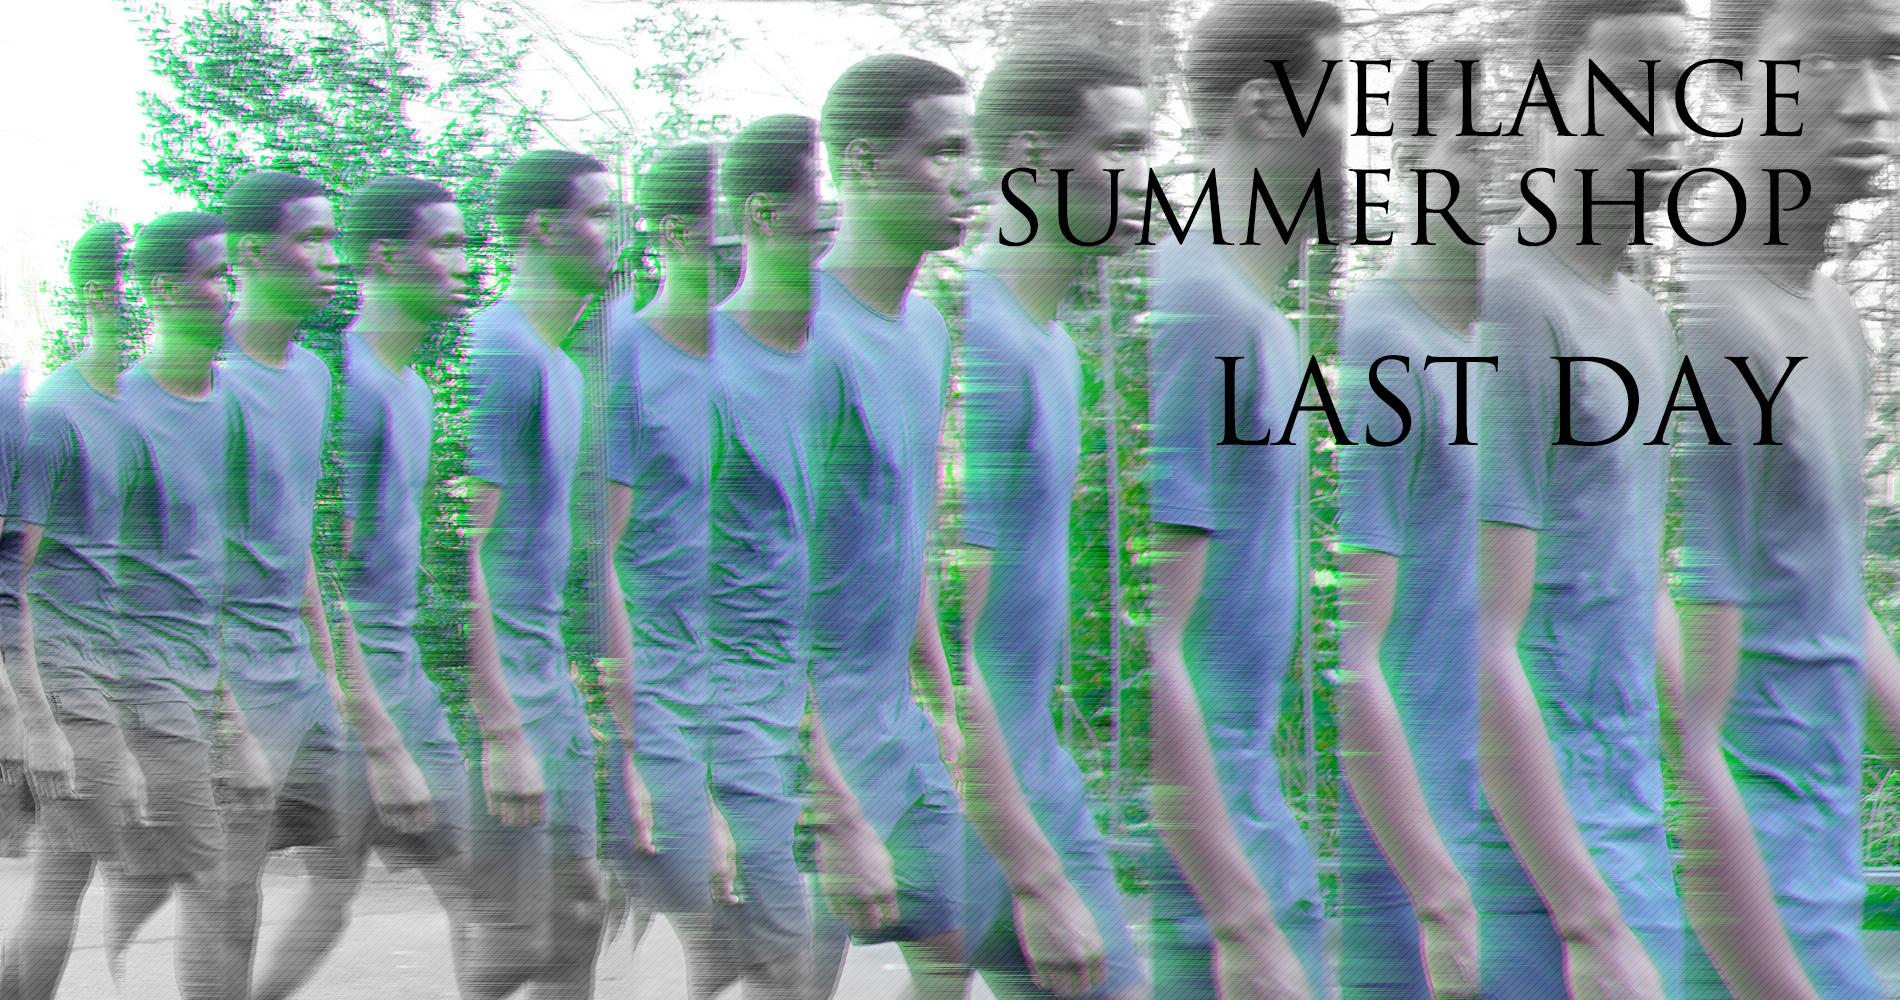 VEILANCE SUMMER SHOP LAST DAY